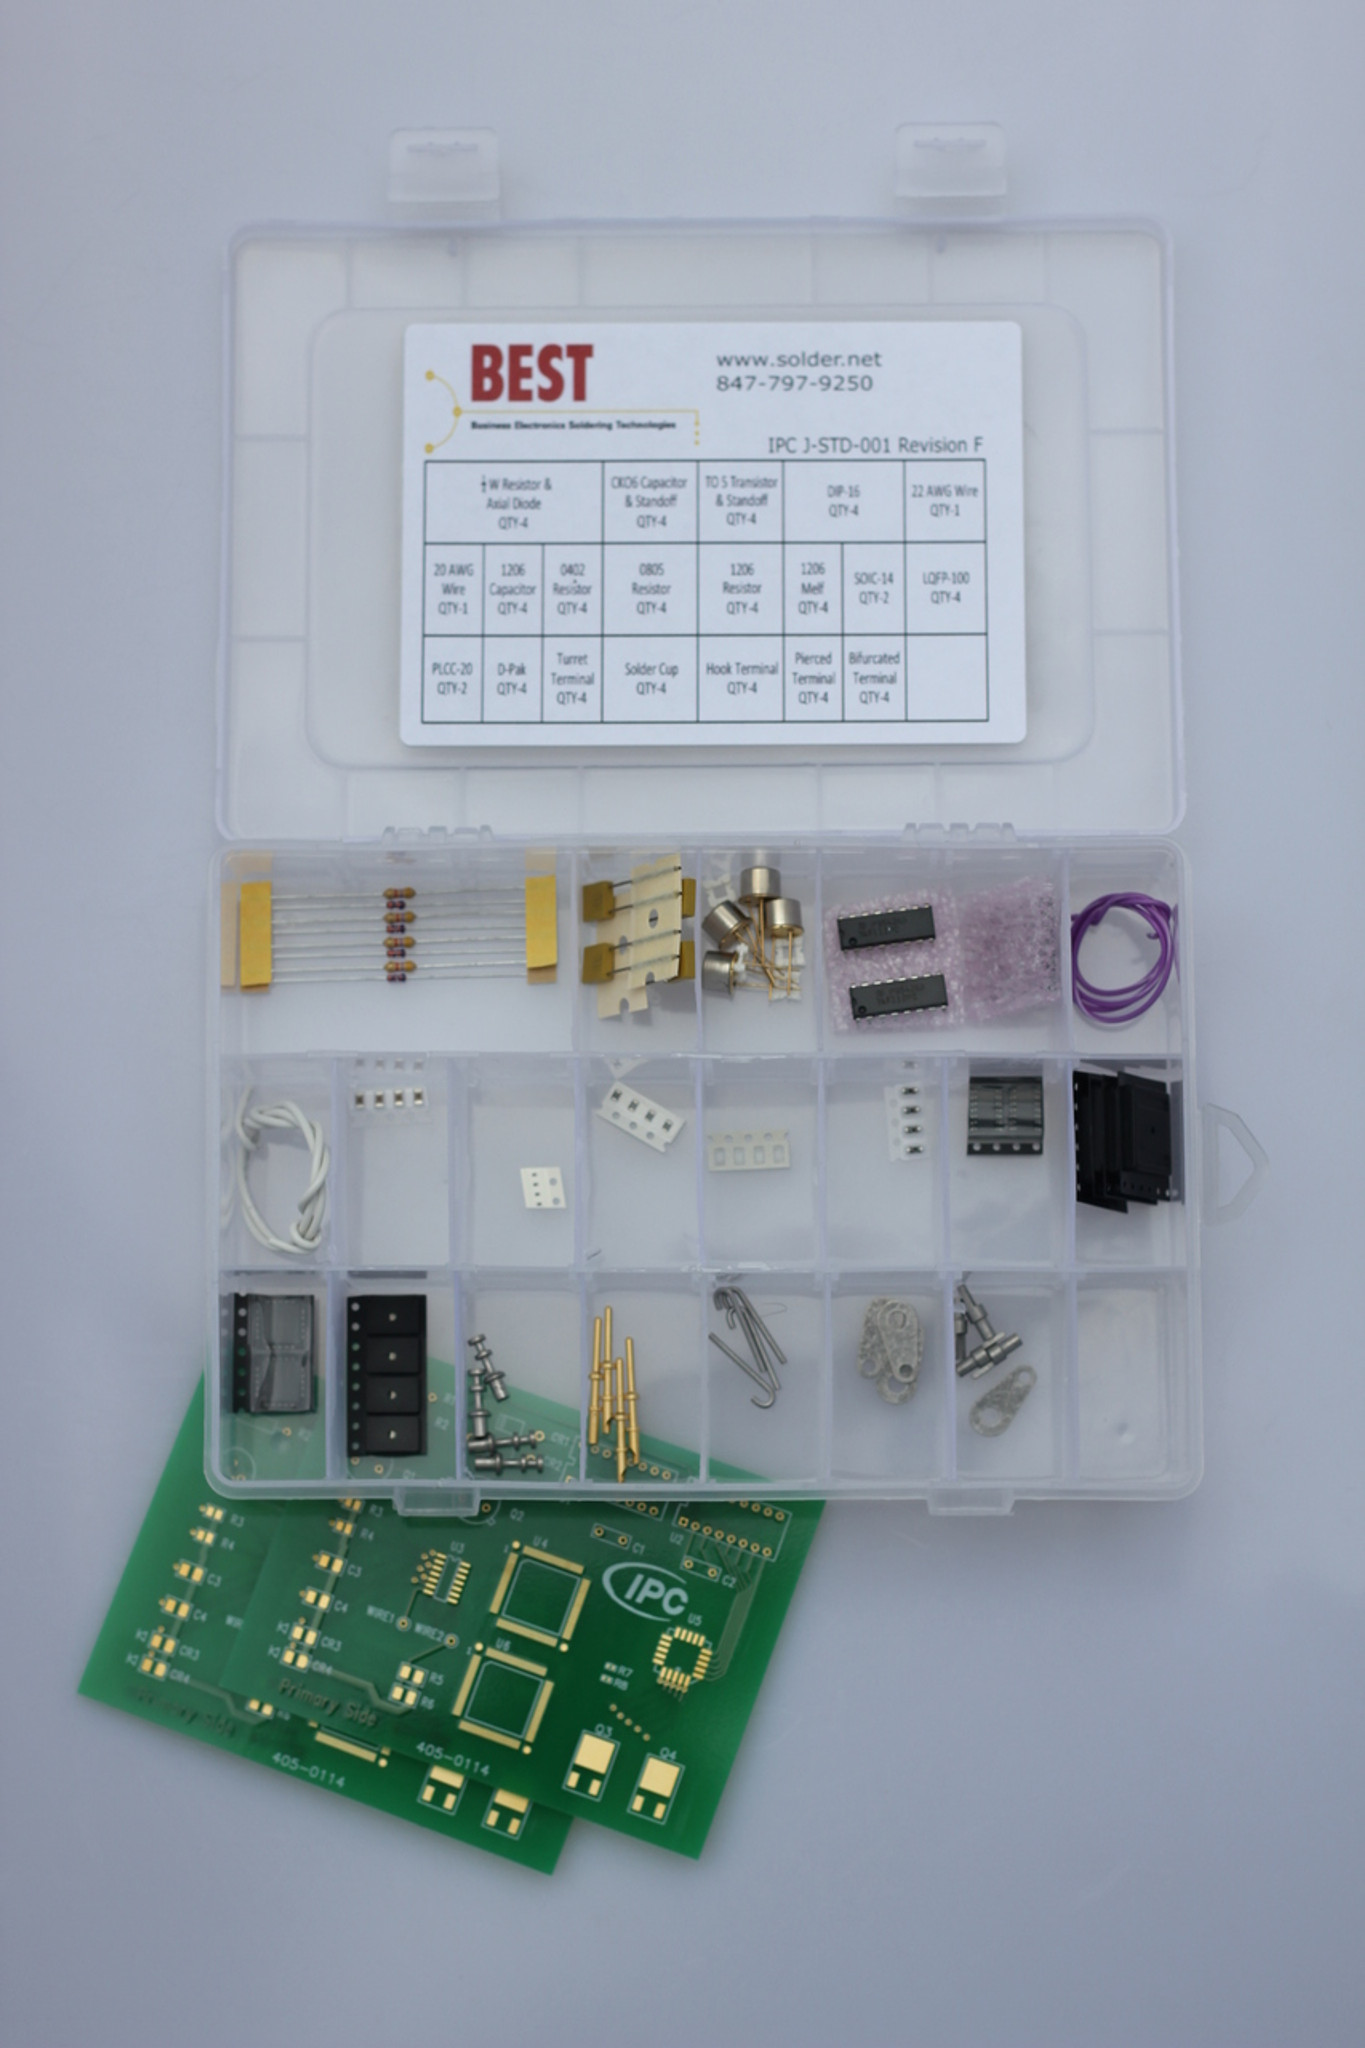 IPC J-STD-001 Revision F / G Solder Training Kit